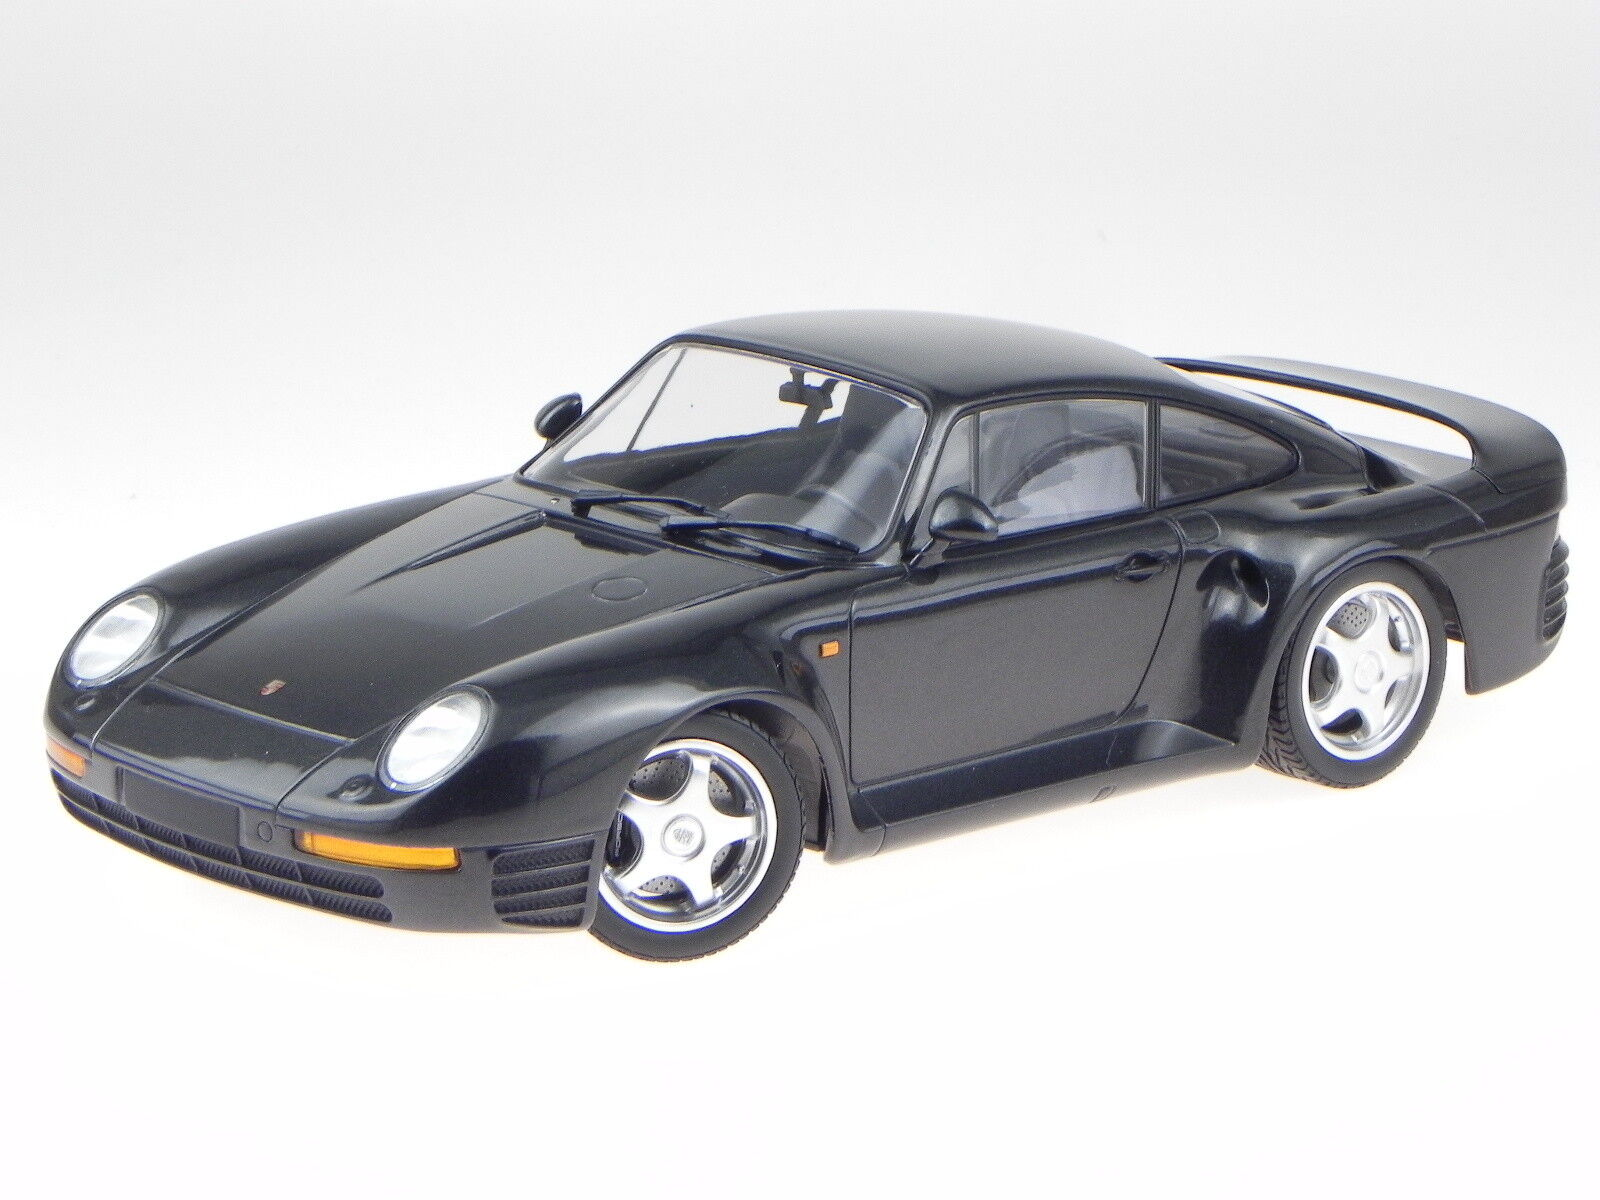 Porsche 959 1987 grå metallisk tärningskastmodellllerl 155066205 Minichamps 1 18